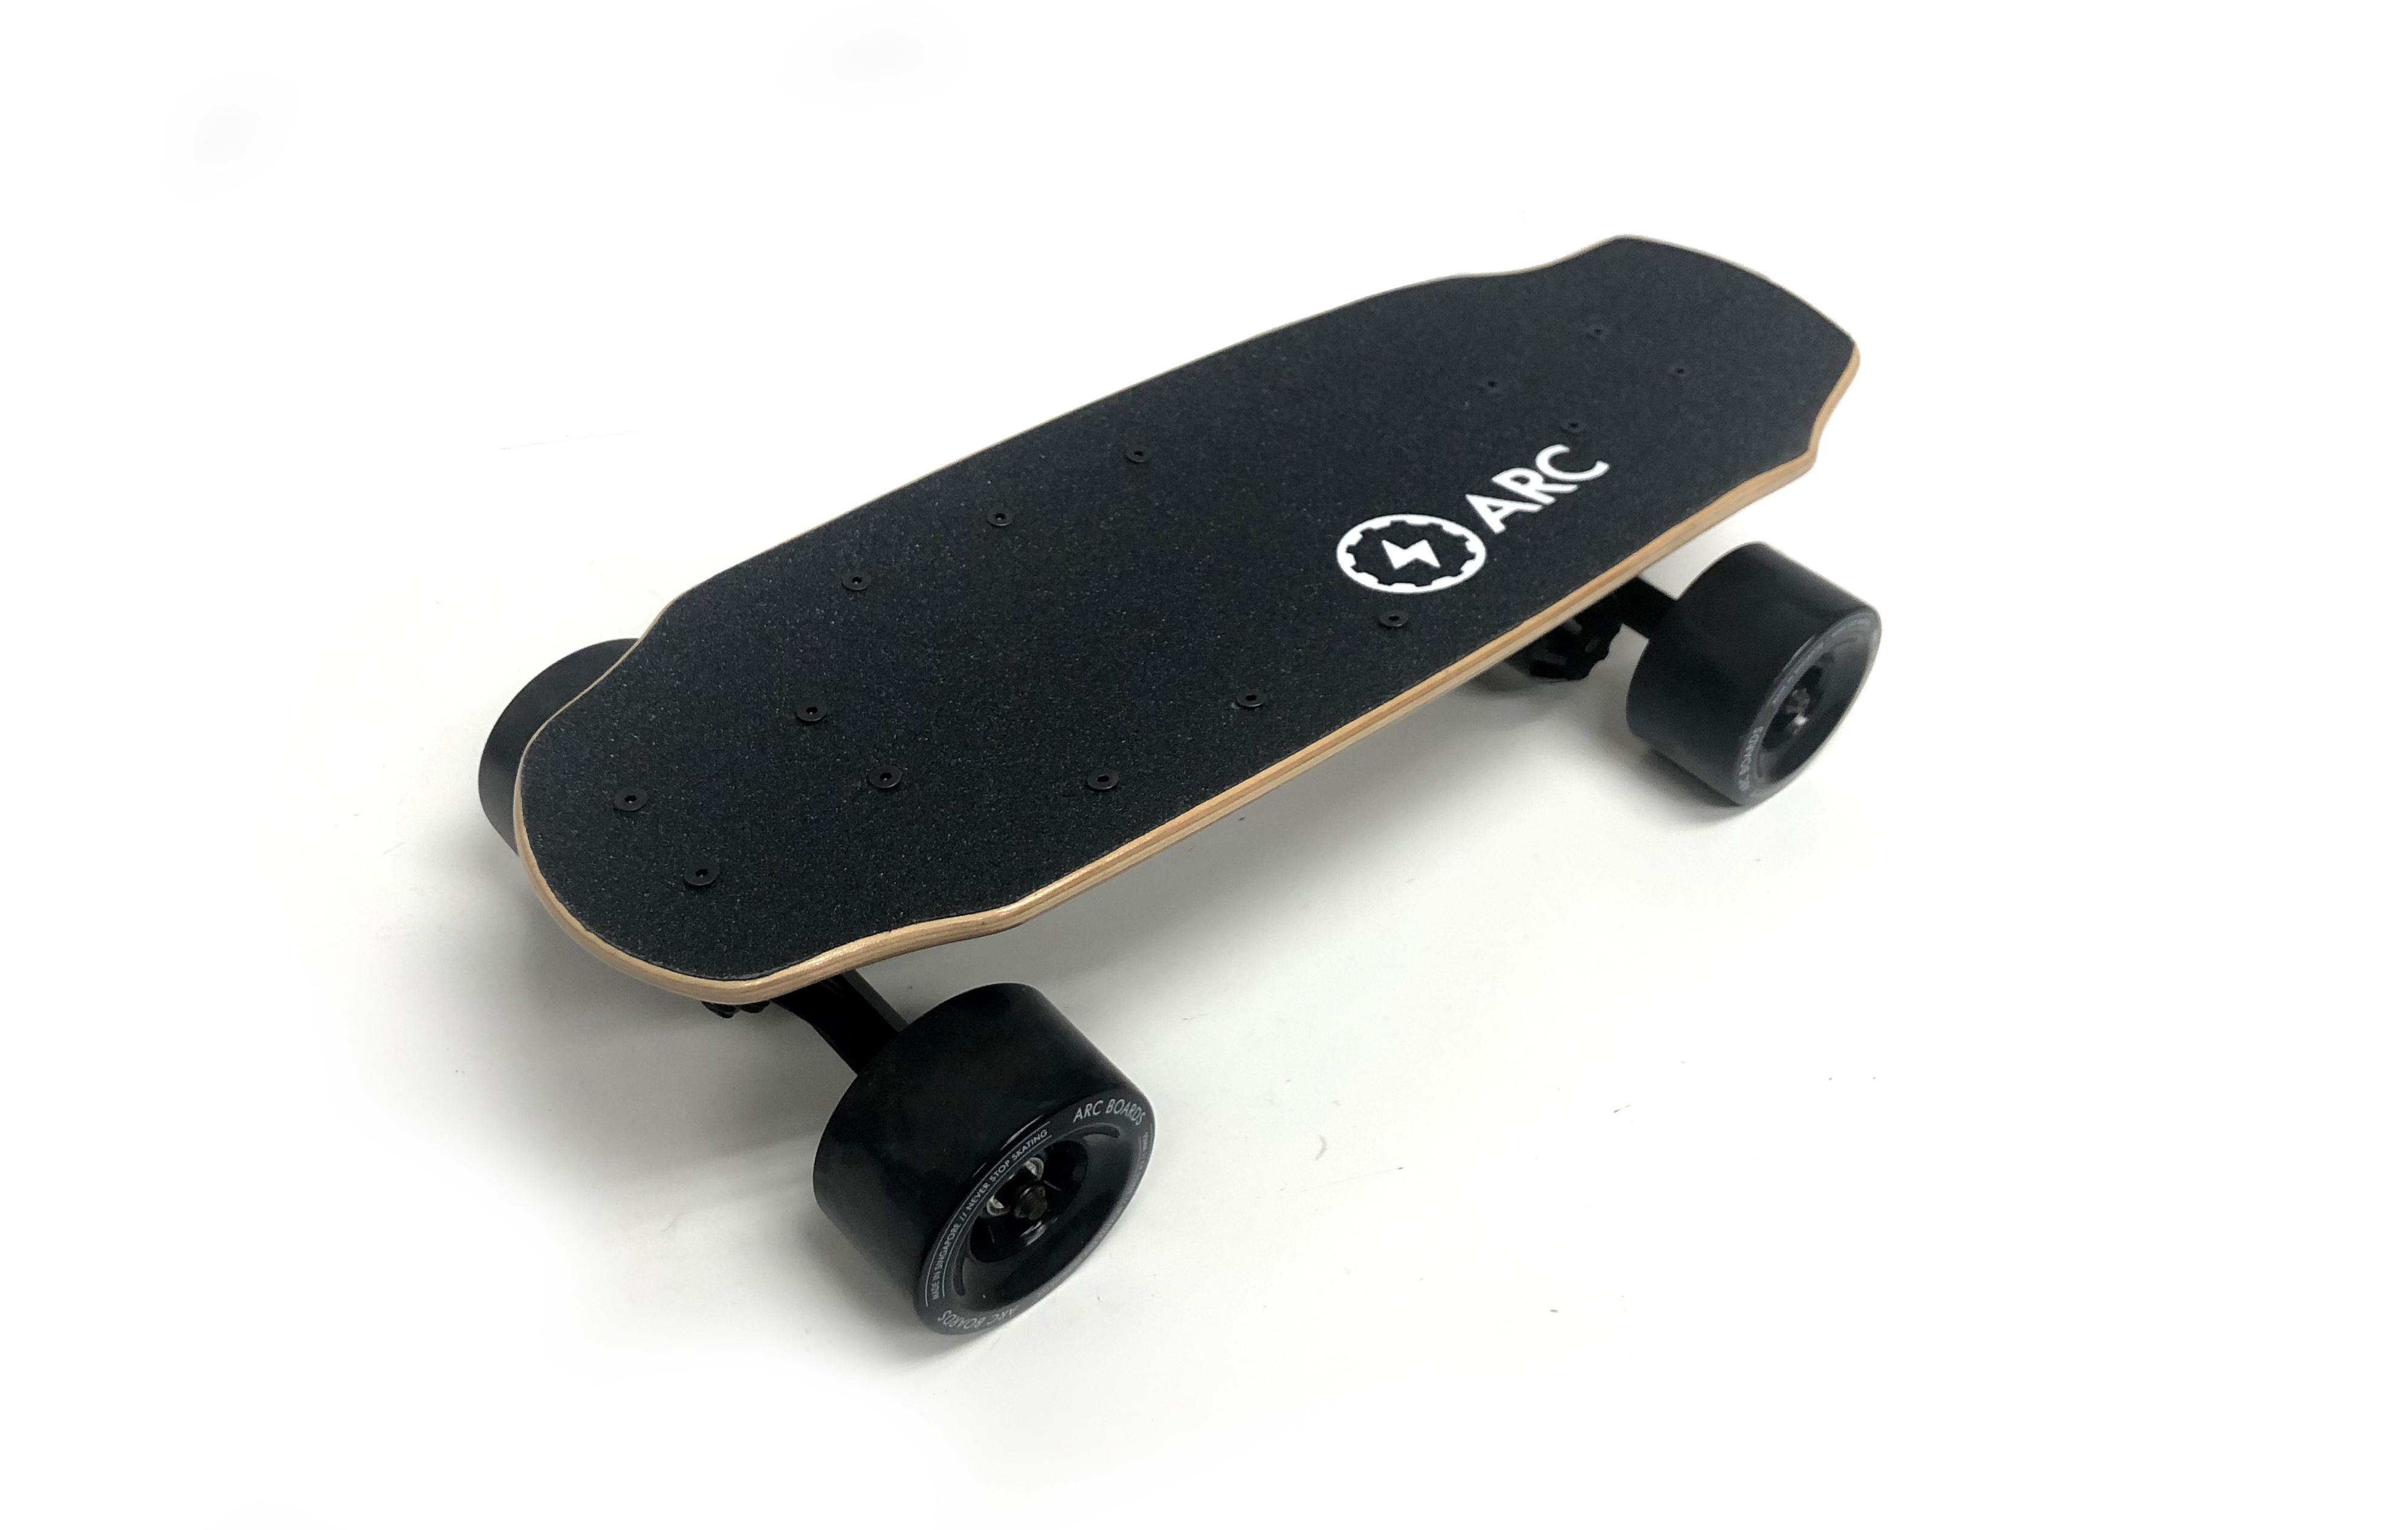 ARC BOARD Next Generation|パワフル電動ペニースケートボード第2世代<限定2台>